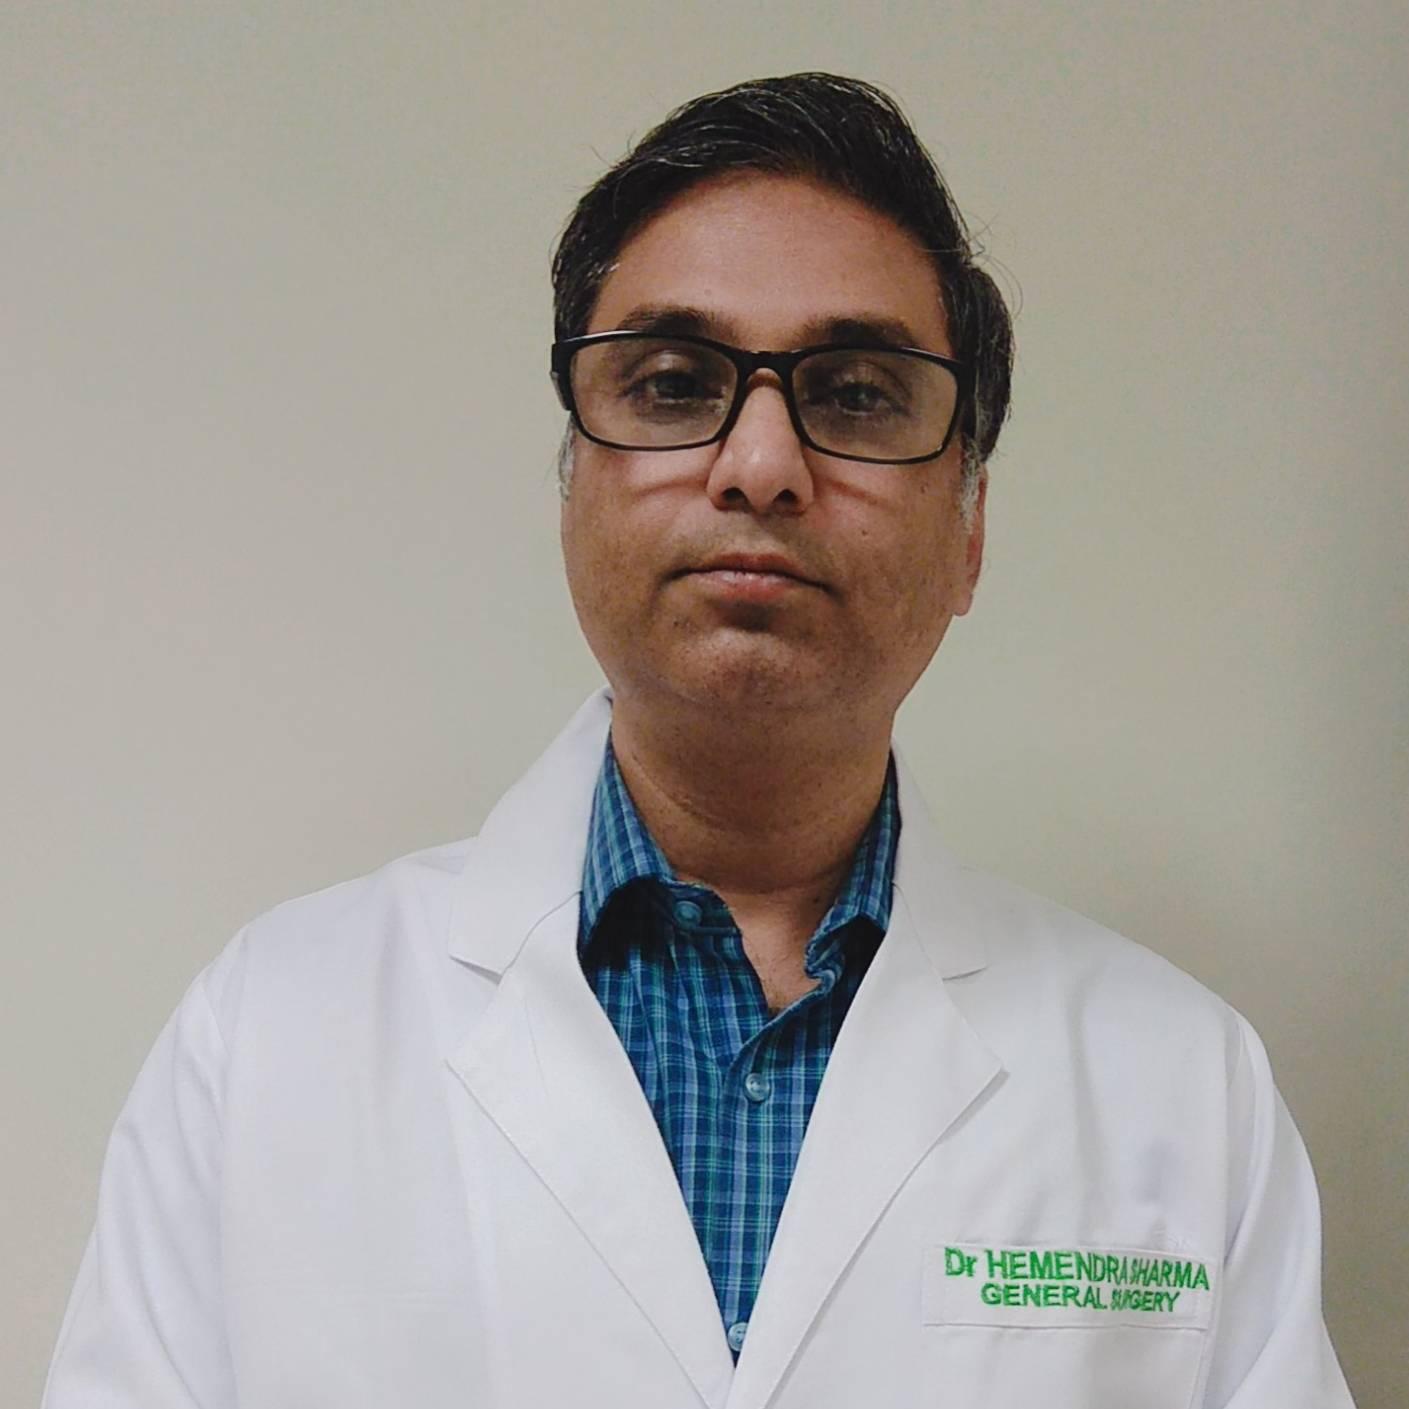 Dr. Hemendra Sharma